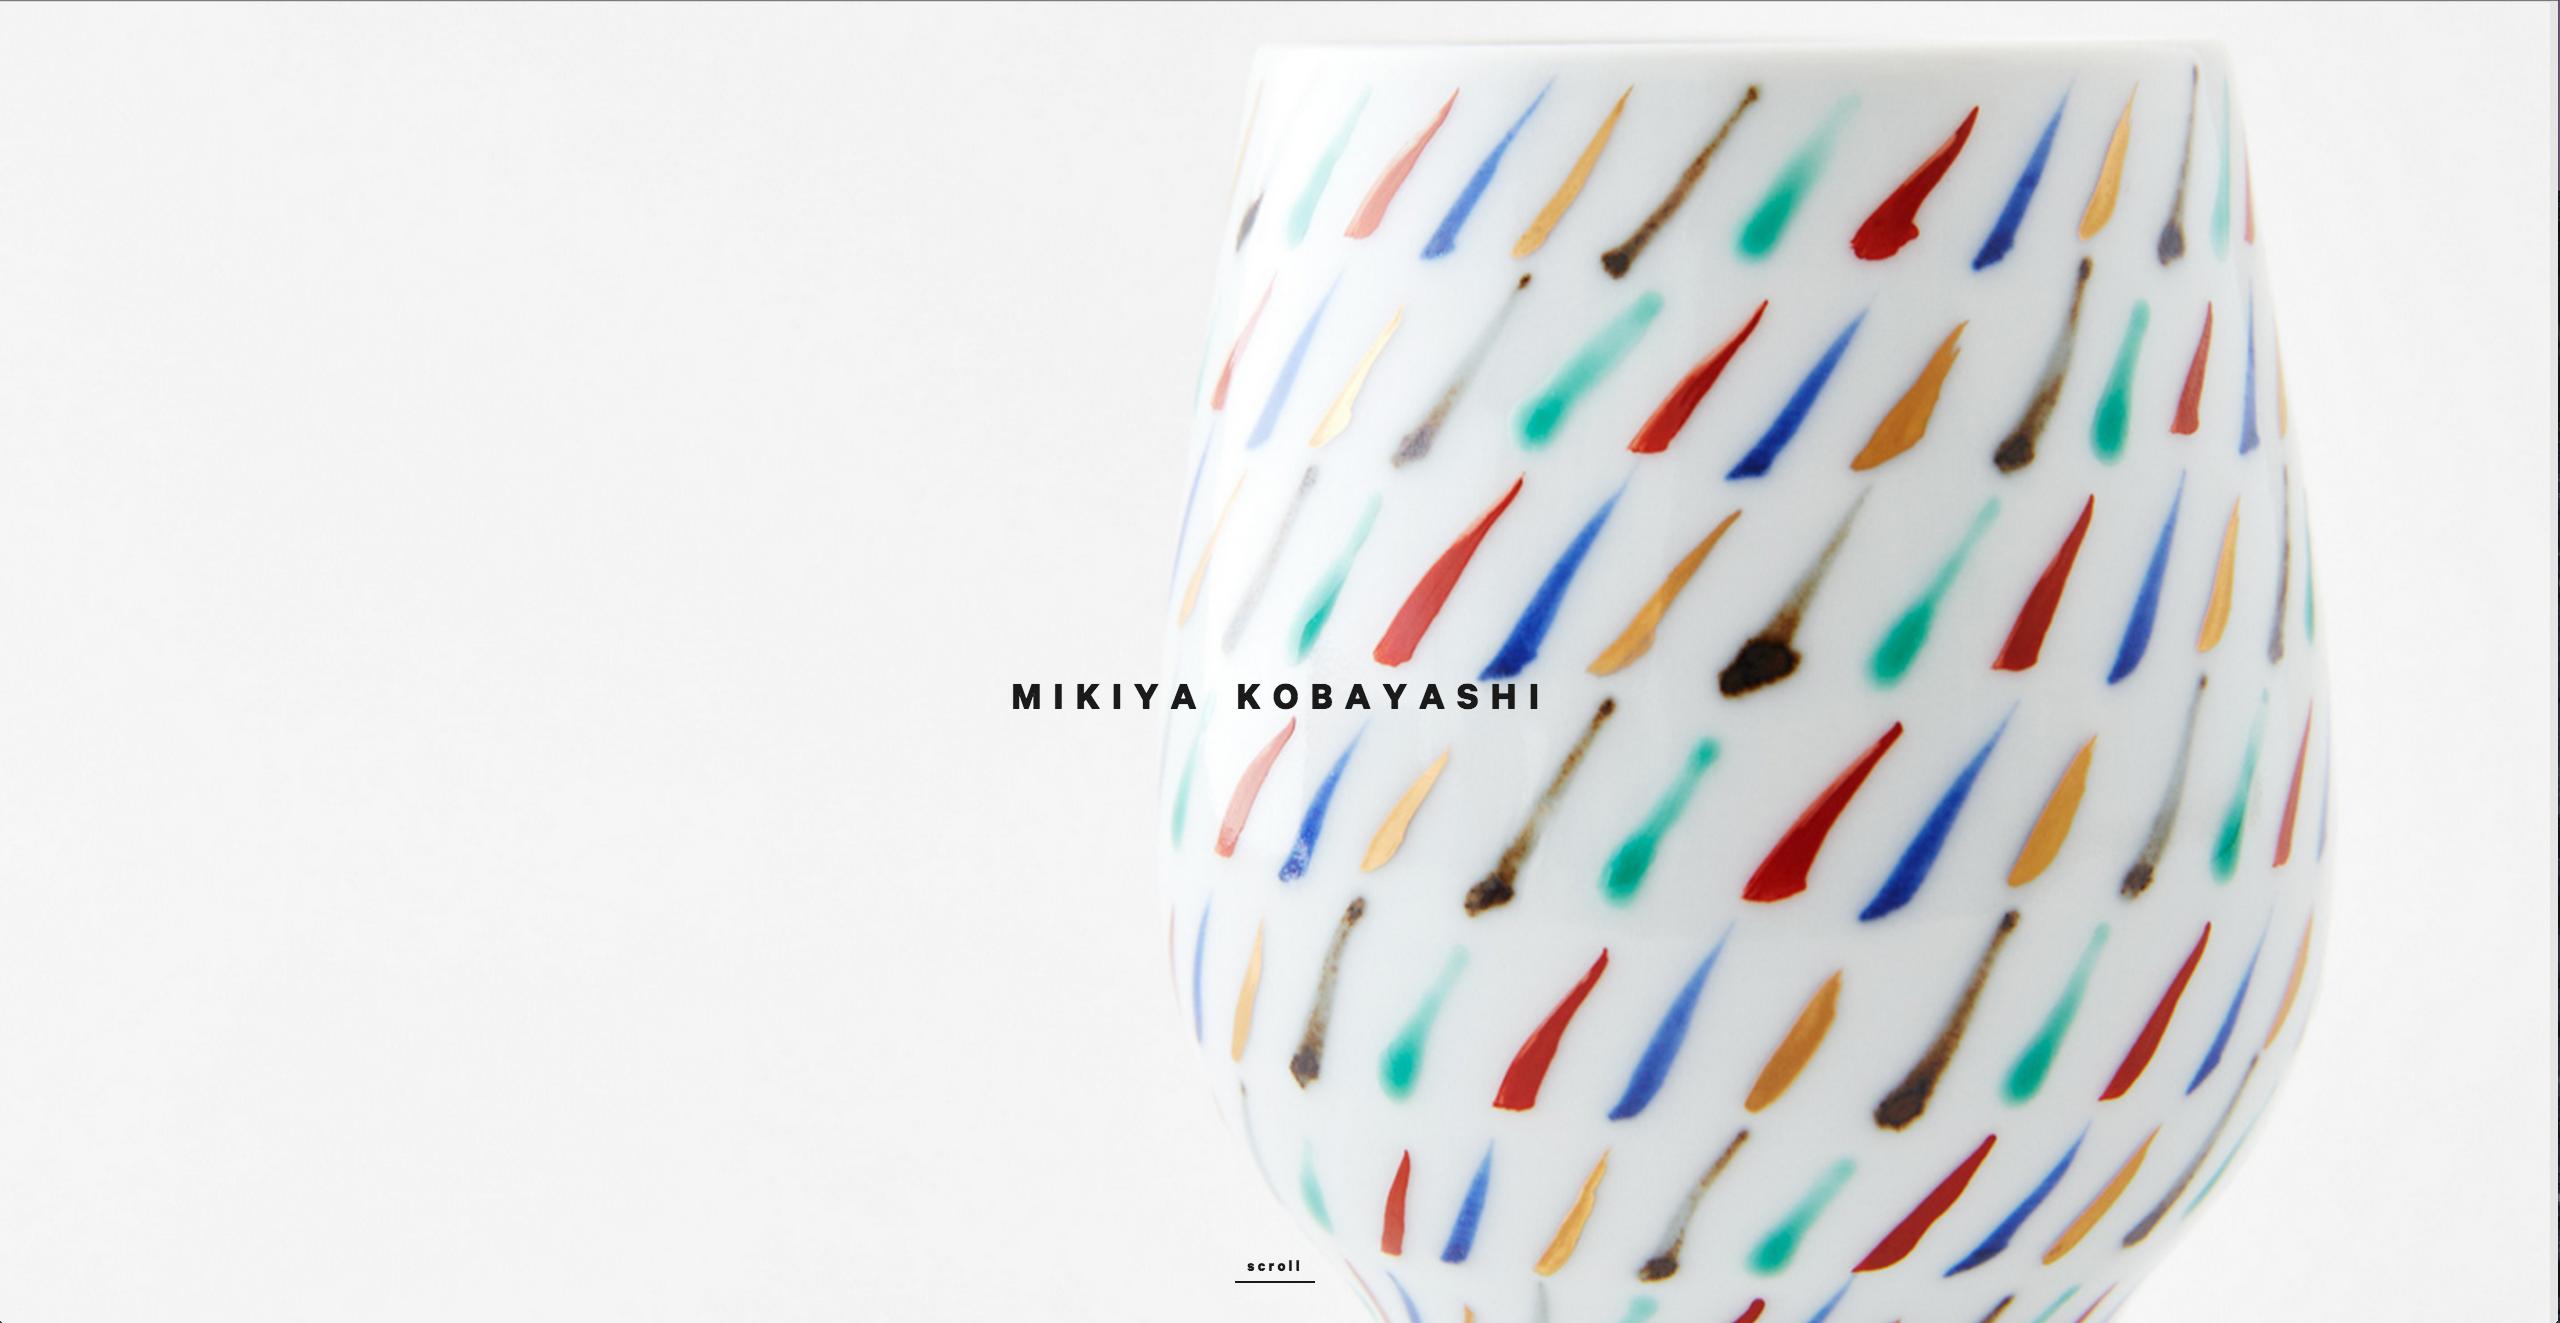 Homepage of Mikiya Kobayashi, an award-winning website